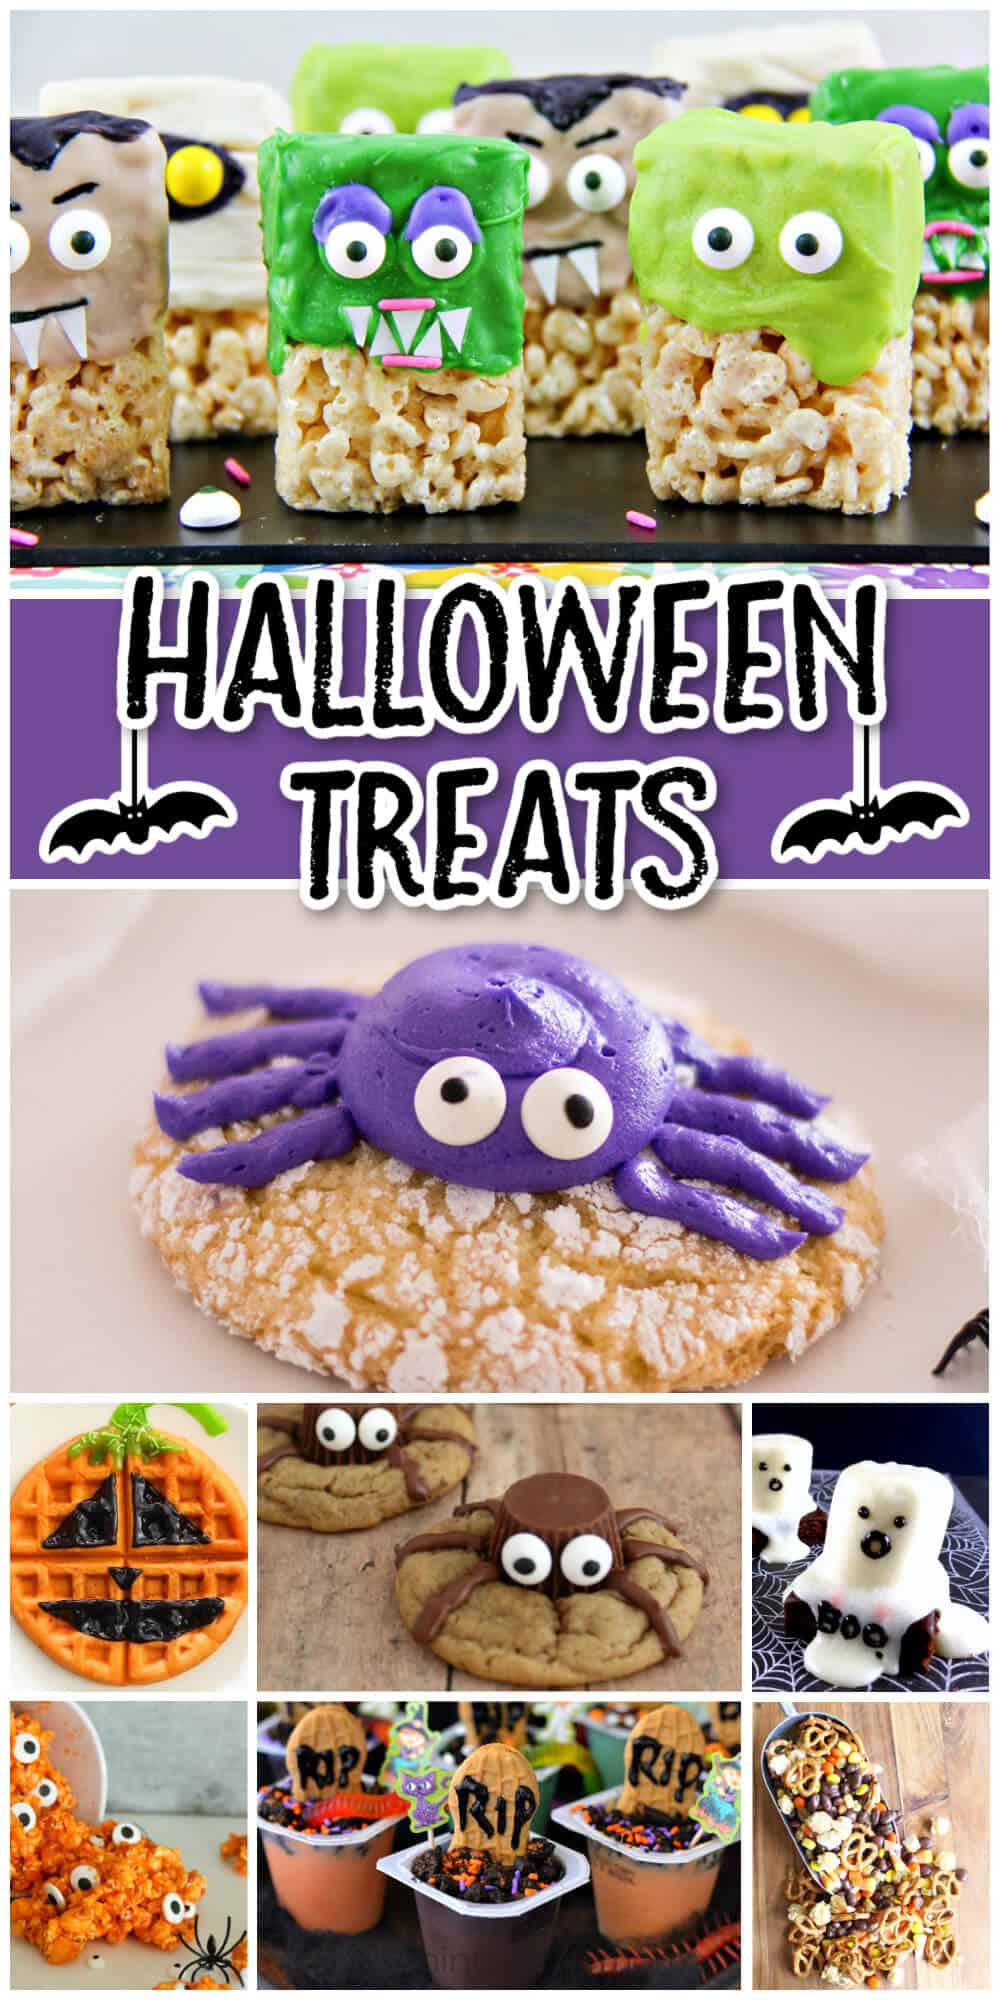 Halloween Recipes - Spooky Treats Kids Will Love